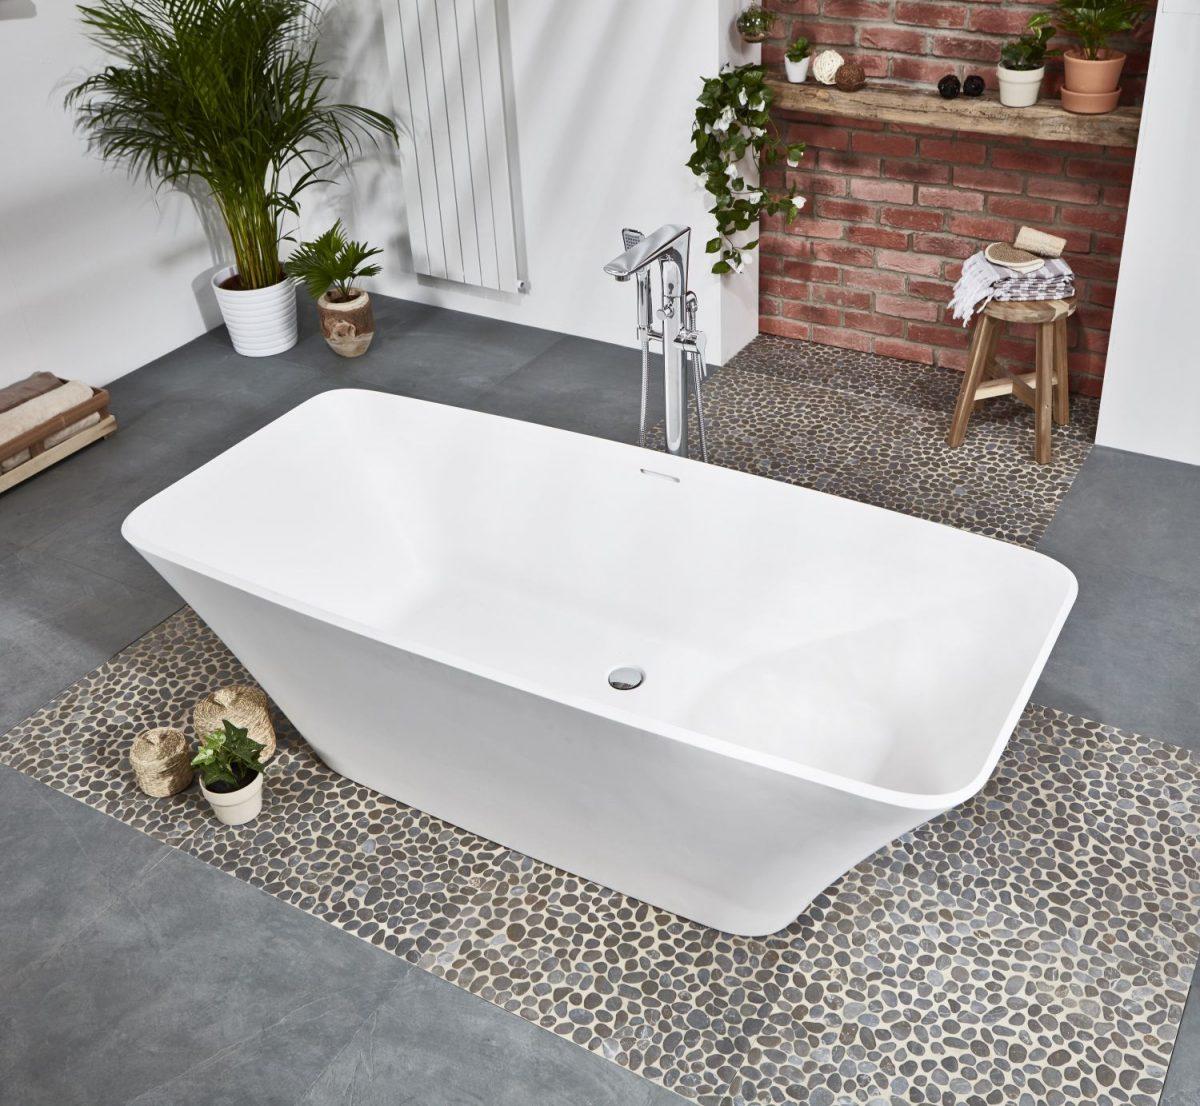 1frontline-bathrooms_aquanatural-elite-bath-1200x1200.jpg